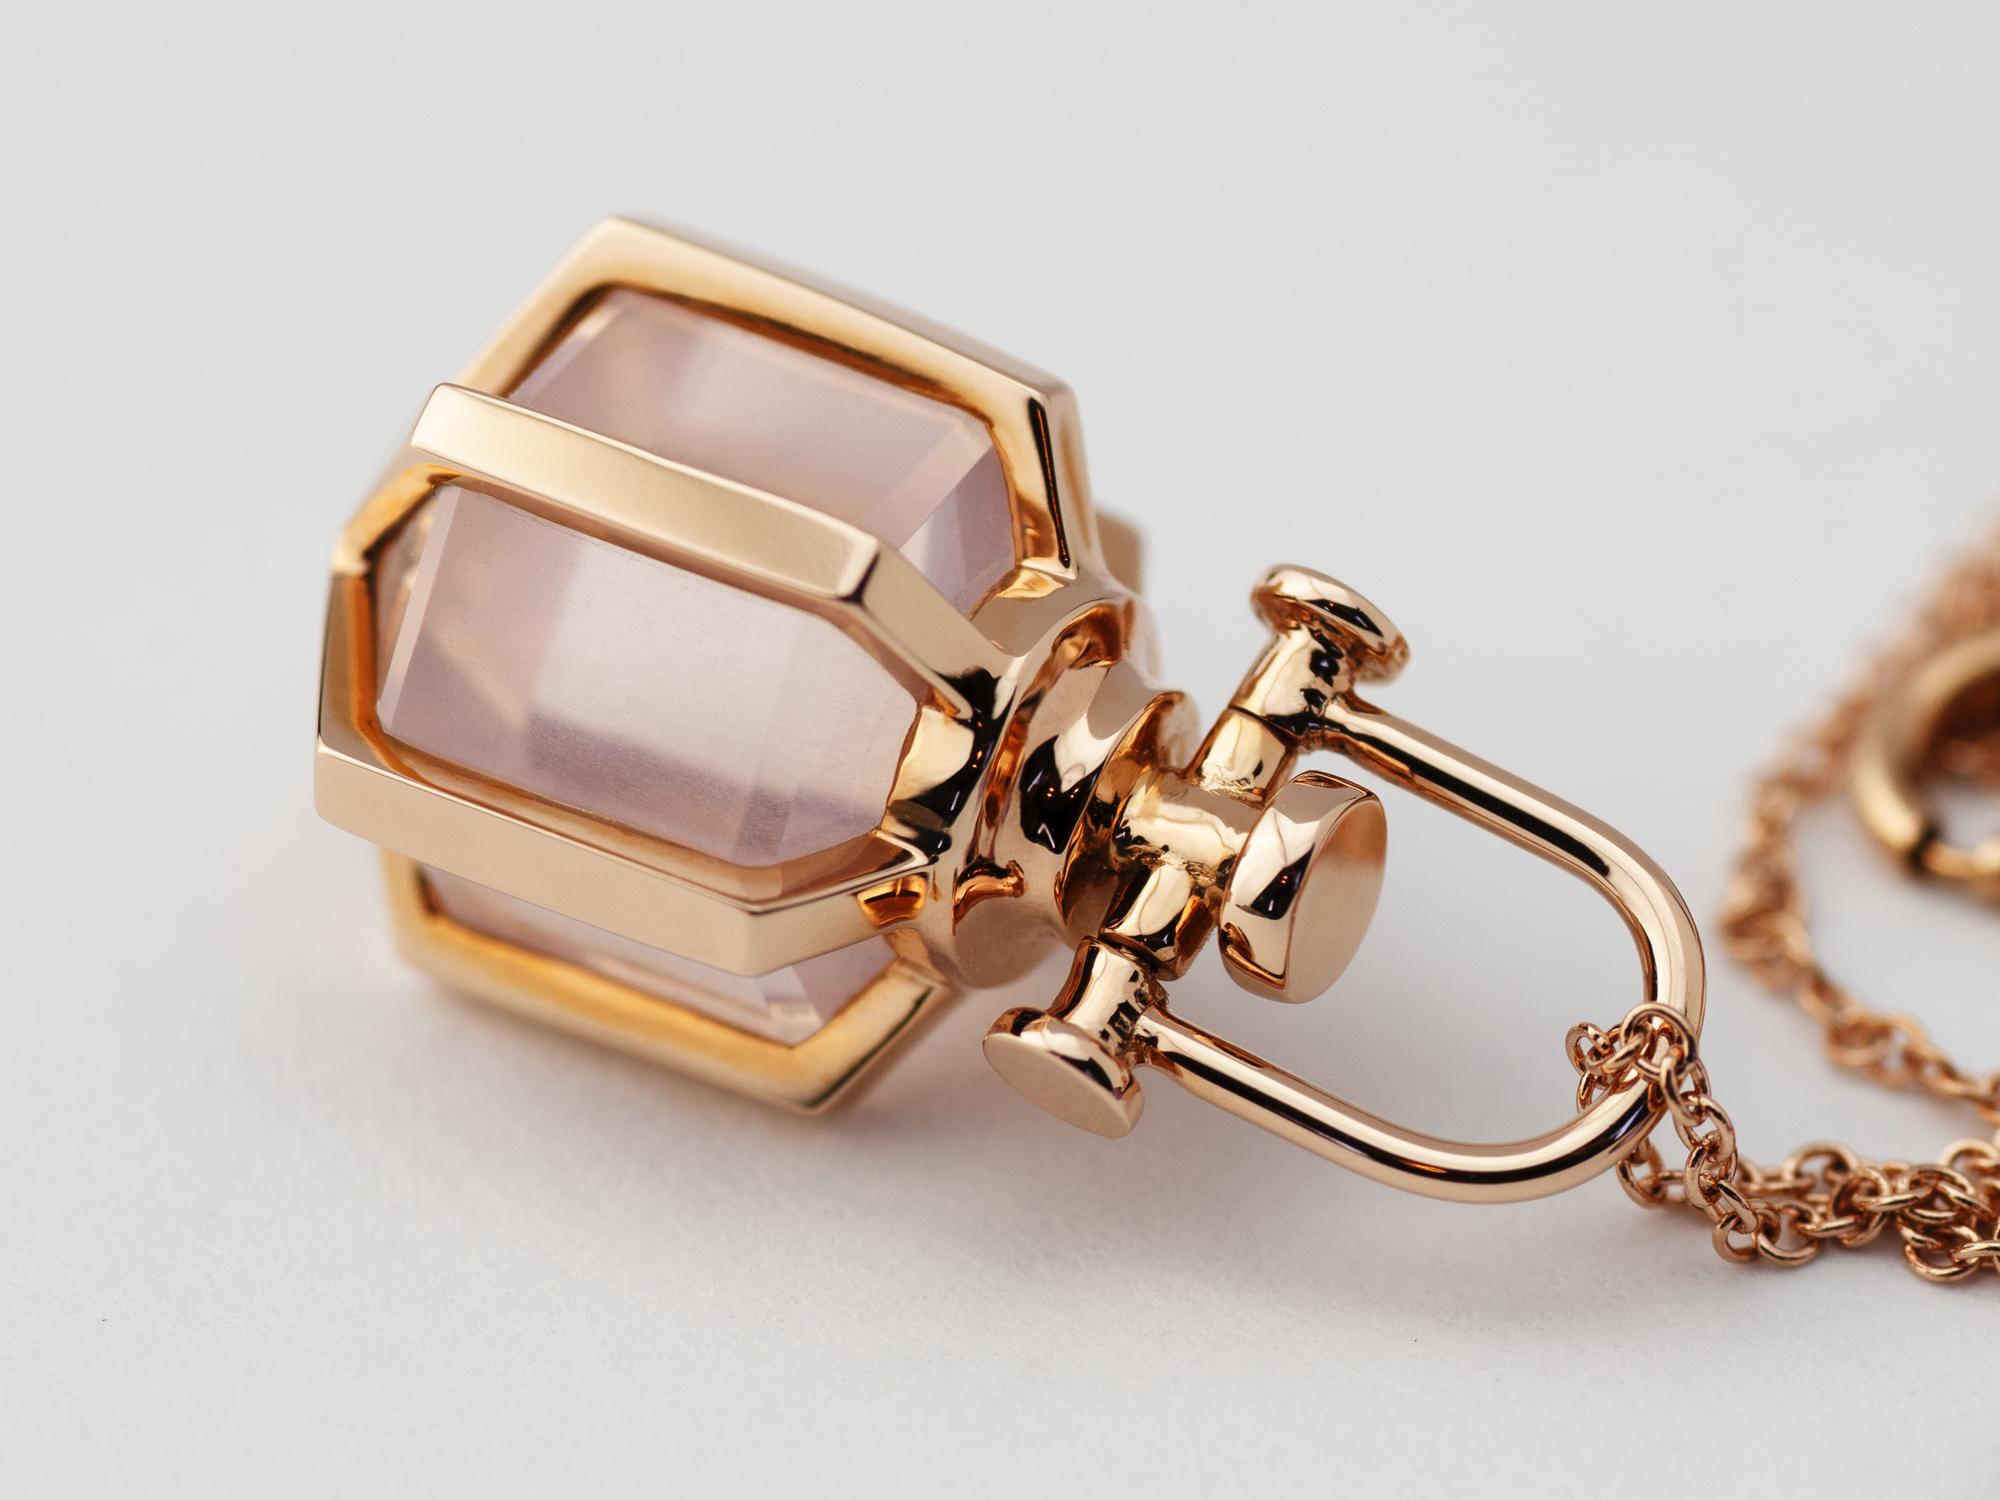 Rebecca Li Mini Six Senses Talisman Pendant Necklace 18k Rose Gold Rose Quartz